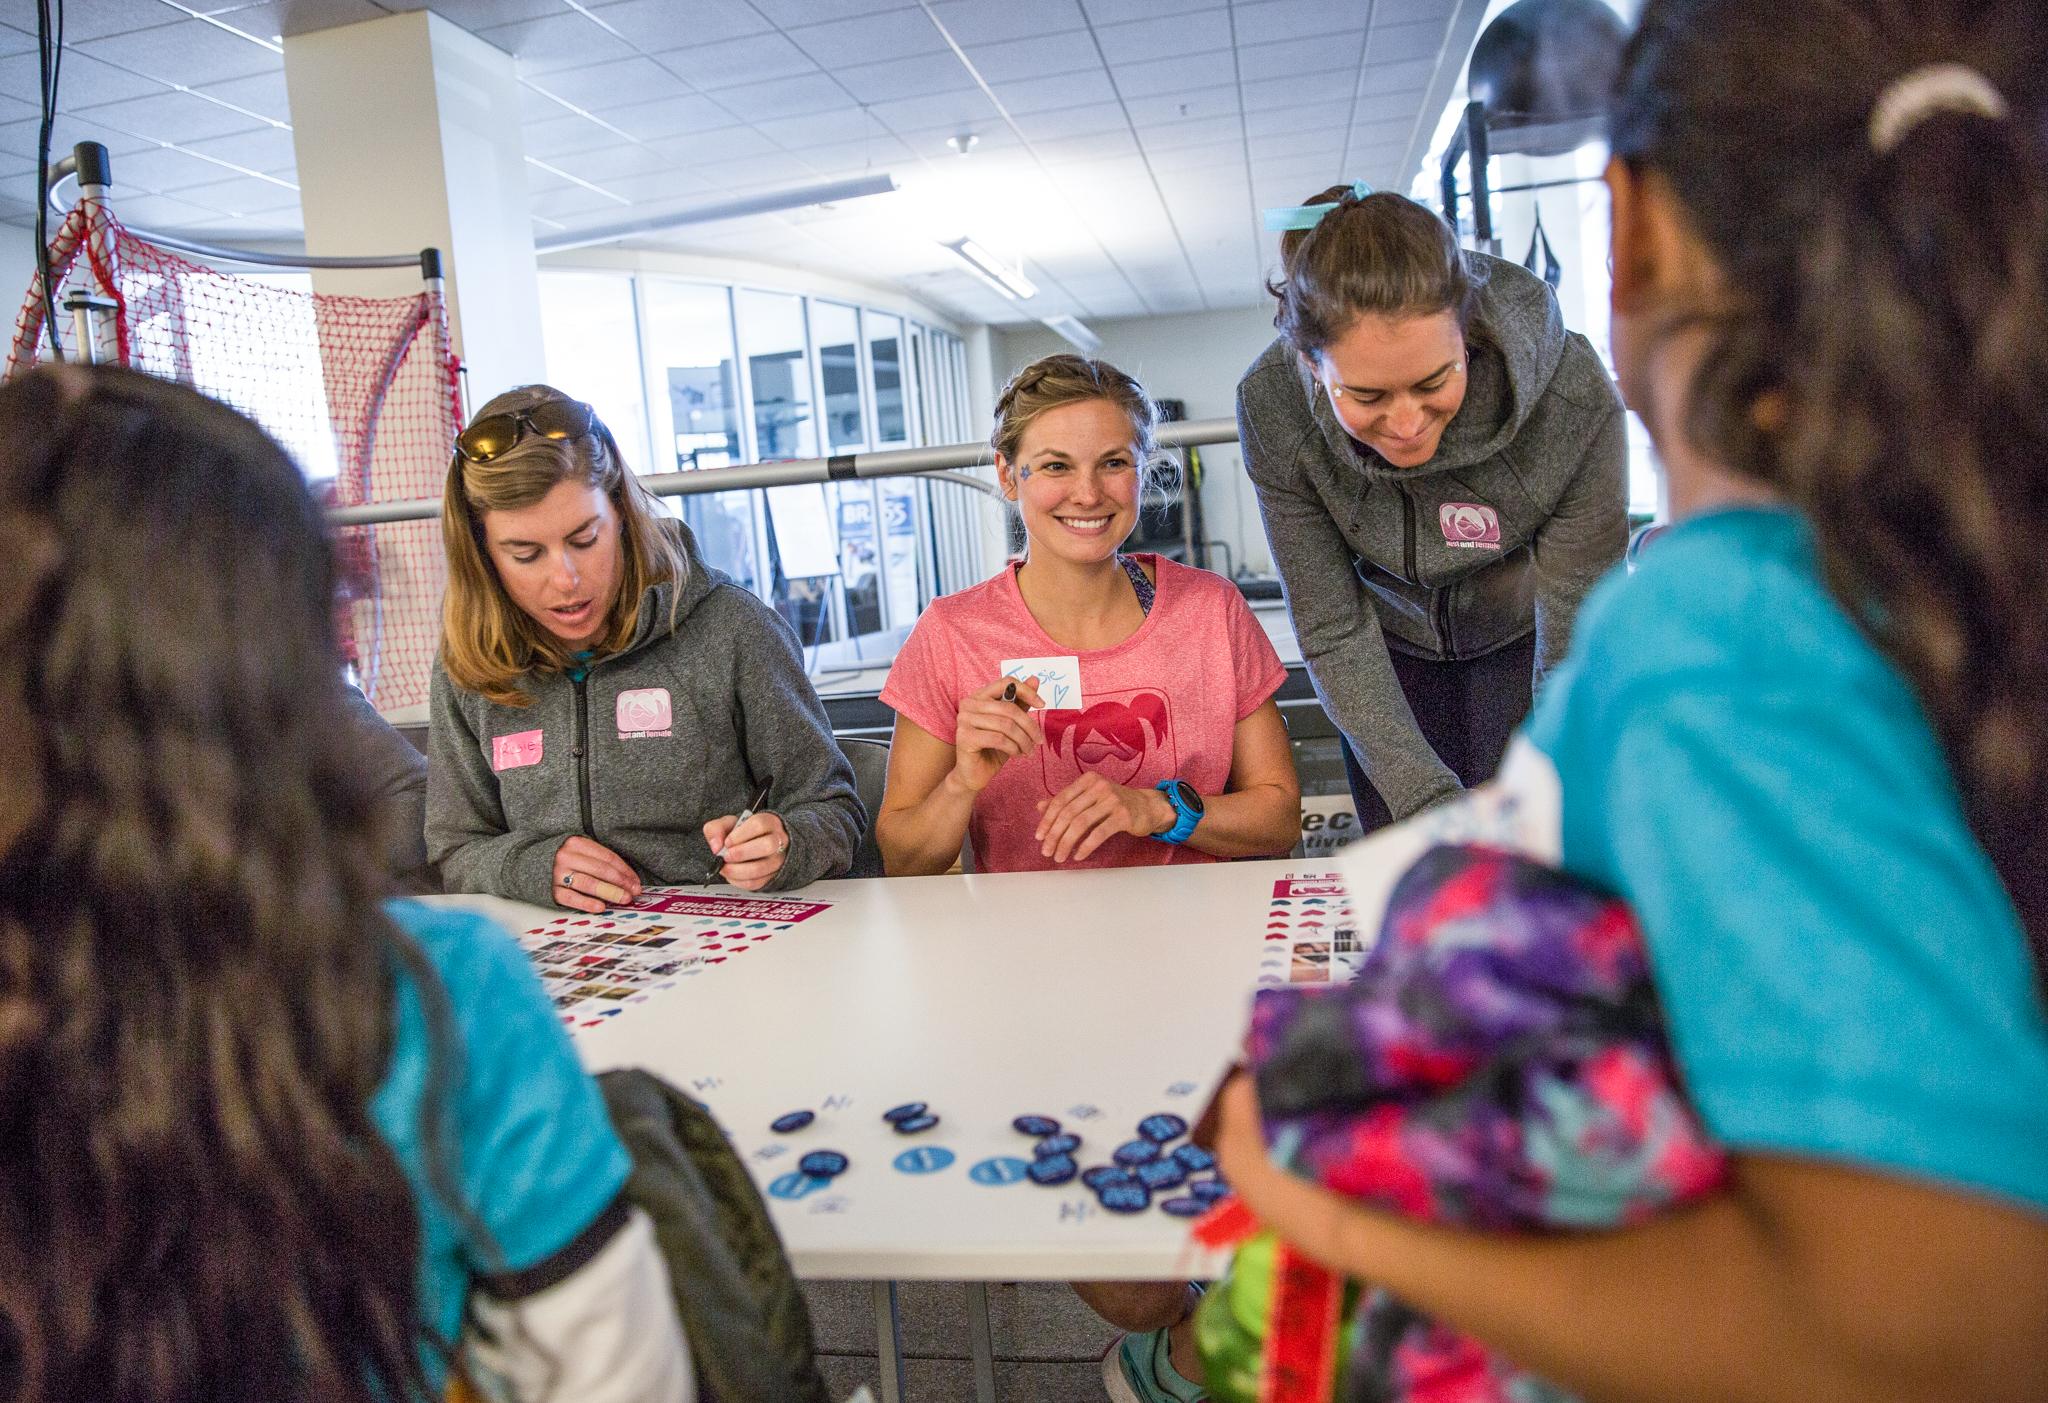 Women and girls working at table (© U.S. Ski & Snowboard)